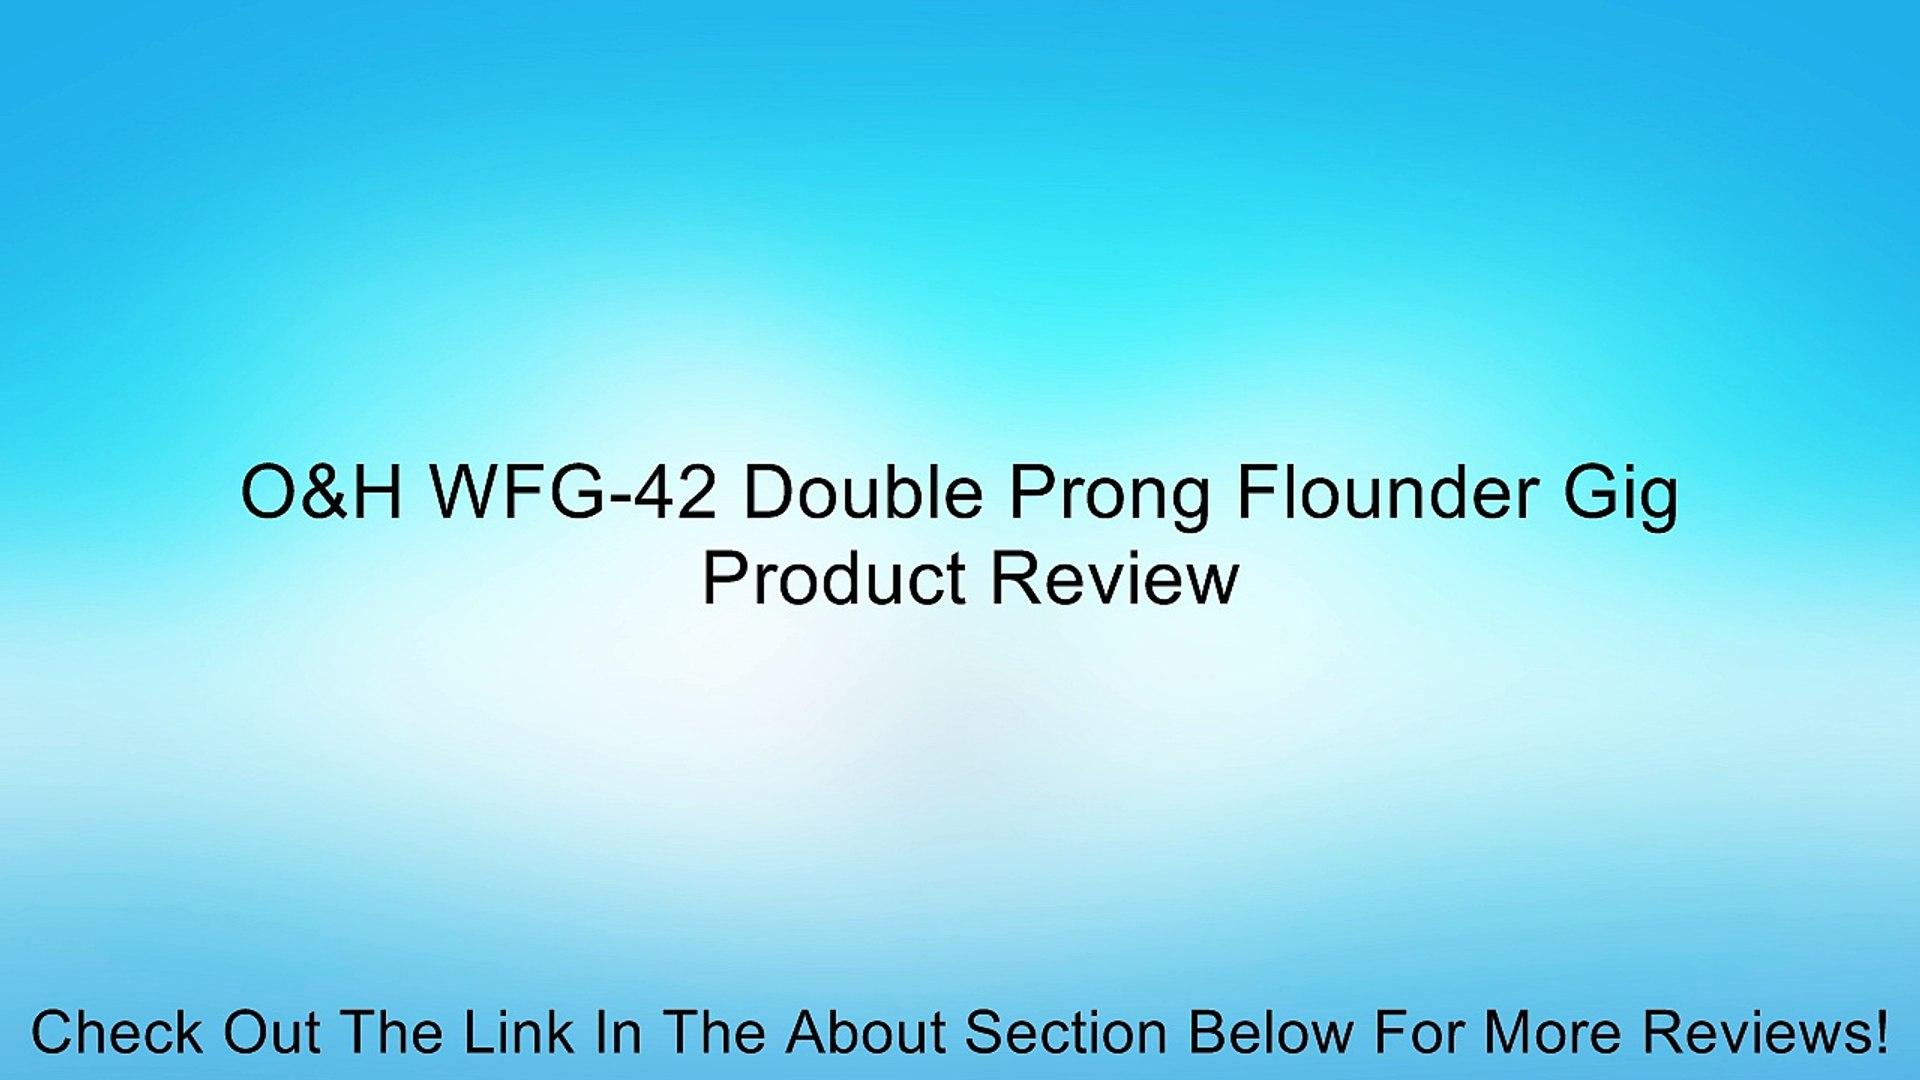 O/&H WFG-42 Double Prong Flounder Gig